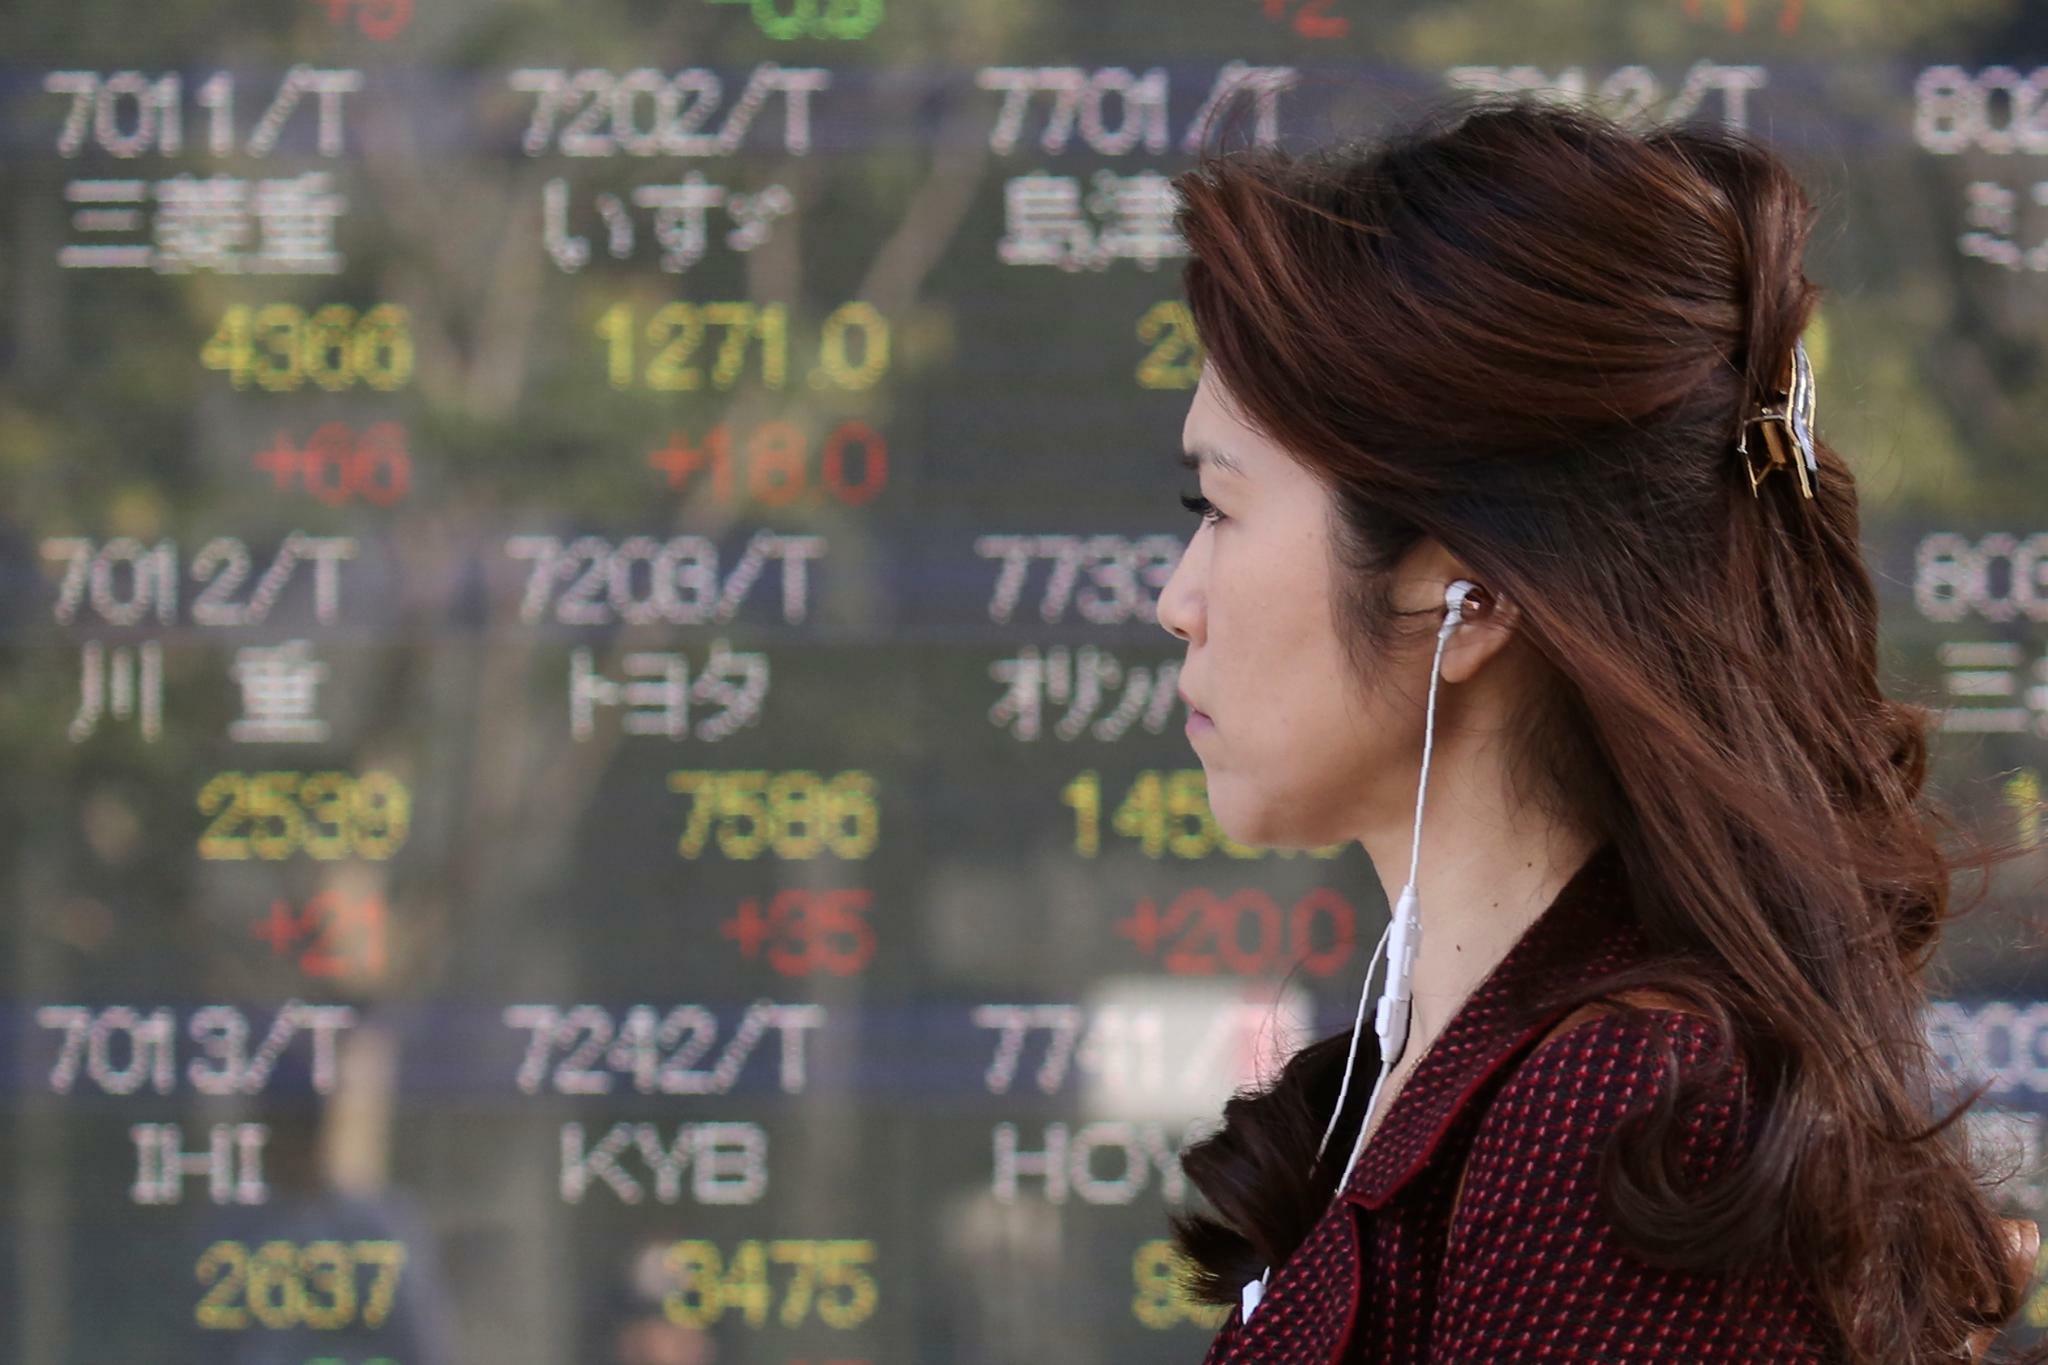 Asiens Anleger klammern sich an Hoffnung auf Handelsdeal